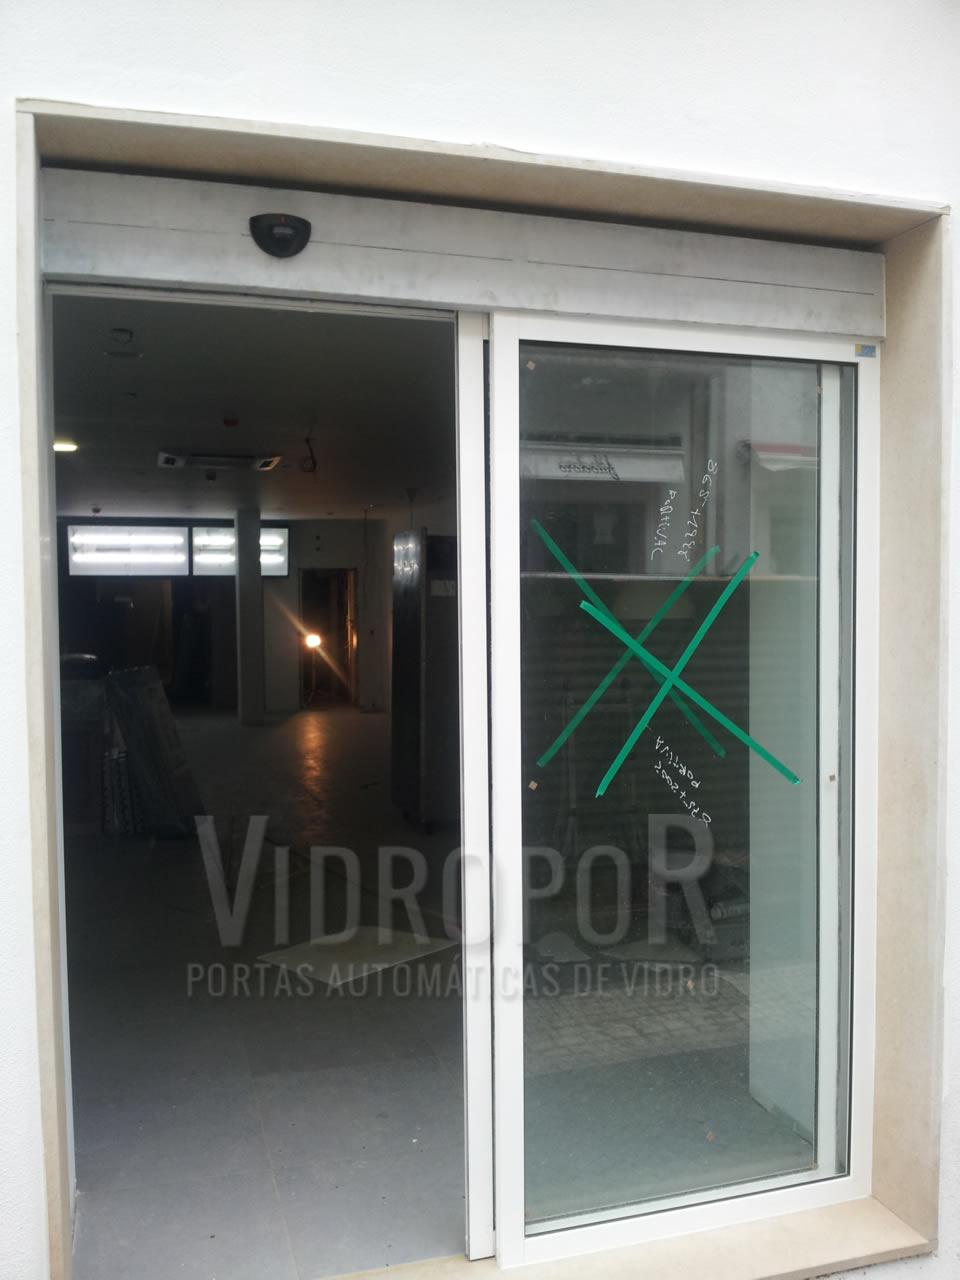 Porta automatica de vidro perfis a cor branco abertura total (a cor poderá ser personalizada ao tom pretendido)